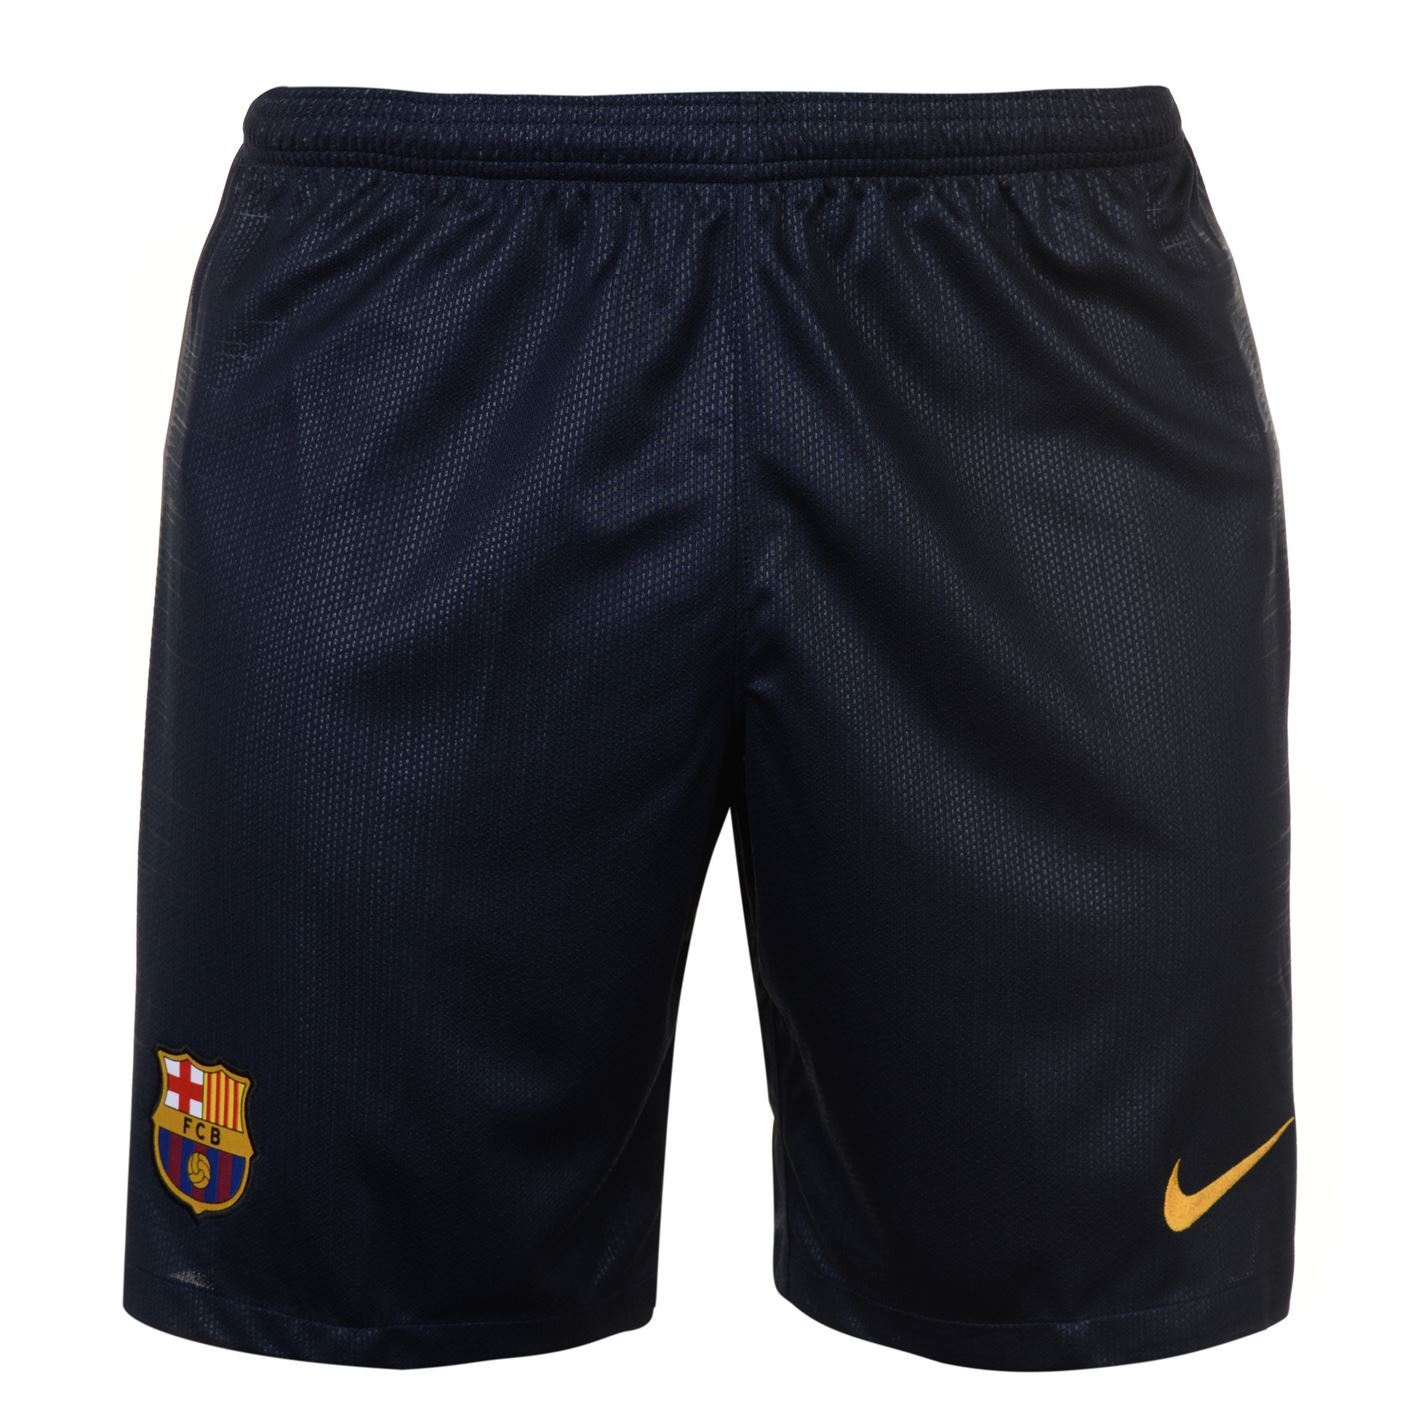 5e5772a14cf ... Nike Barcelona Home Shorts 2018 2019 Mens Navy Football Soccer Fan  Sportswear ...